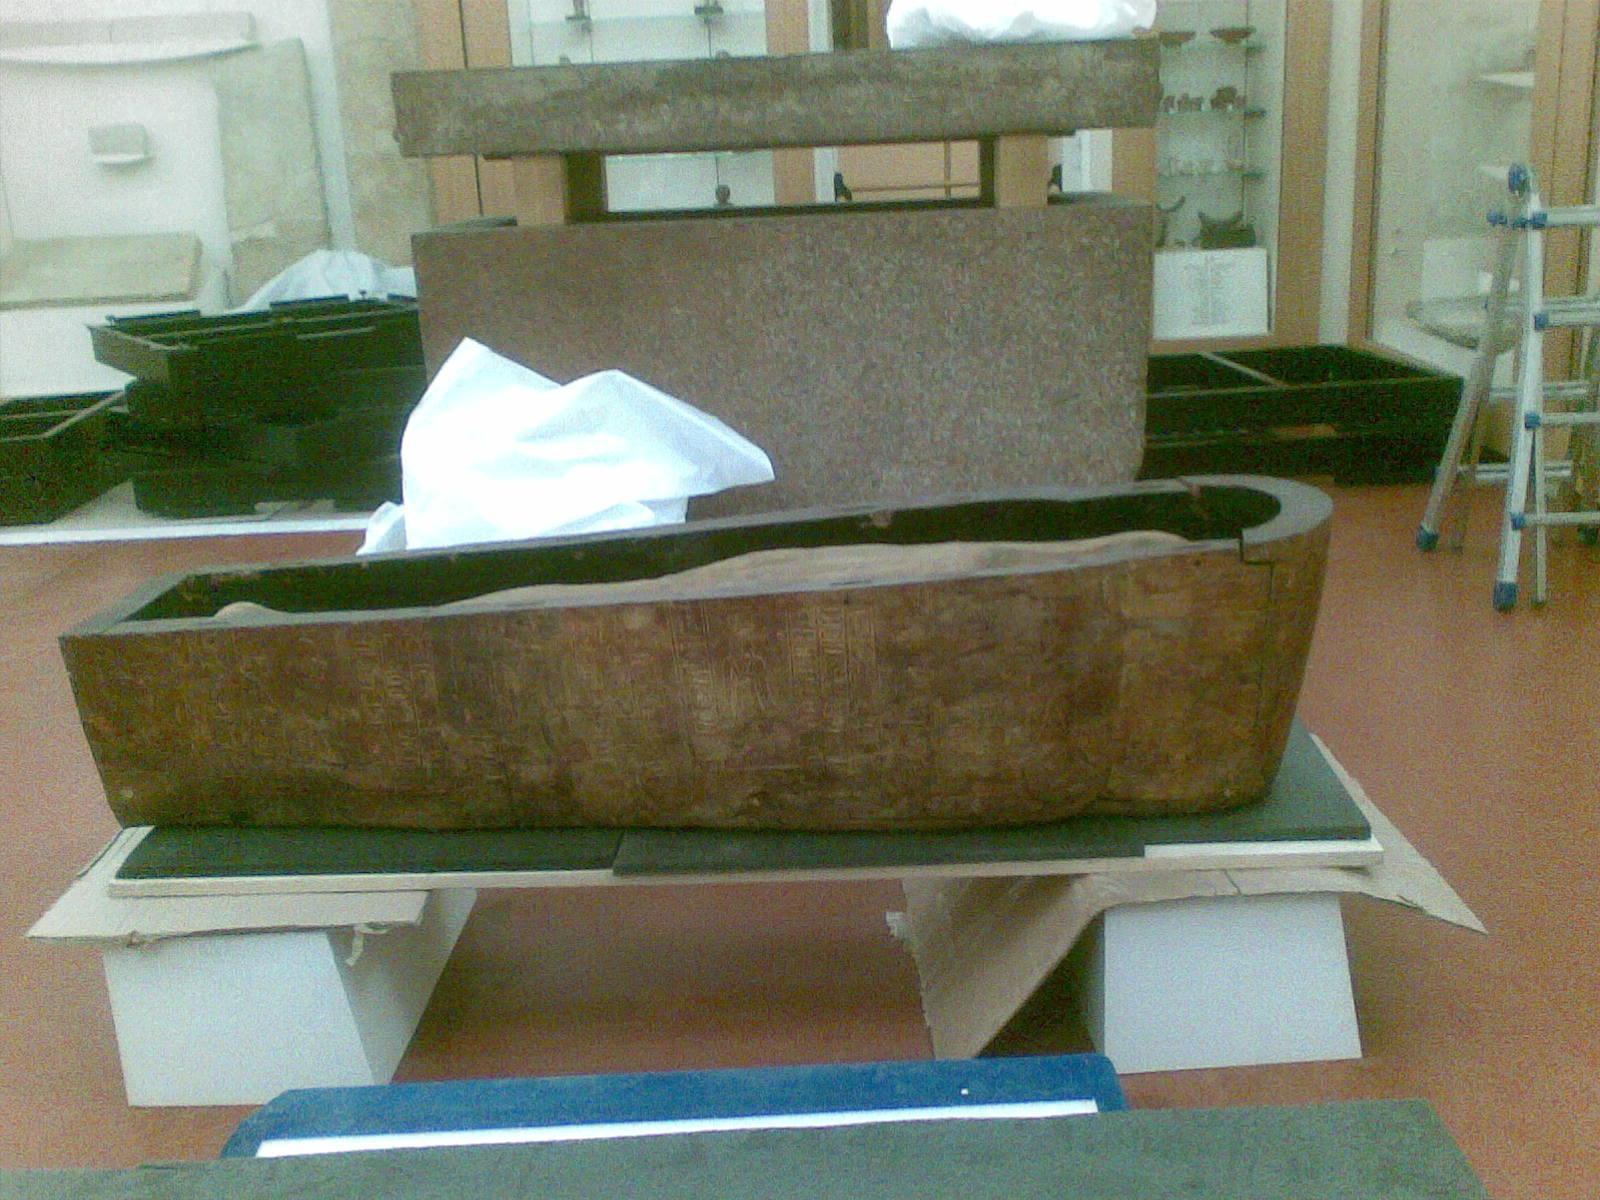 Egizio 2010 marzo Tomba di Kha mummia 2